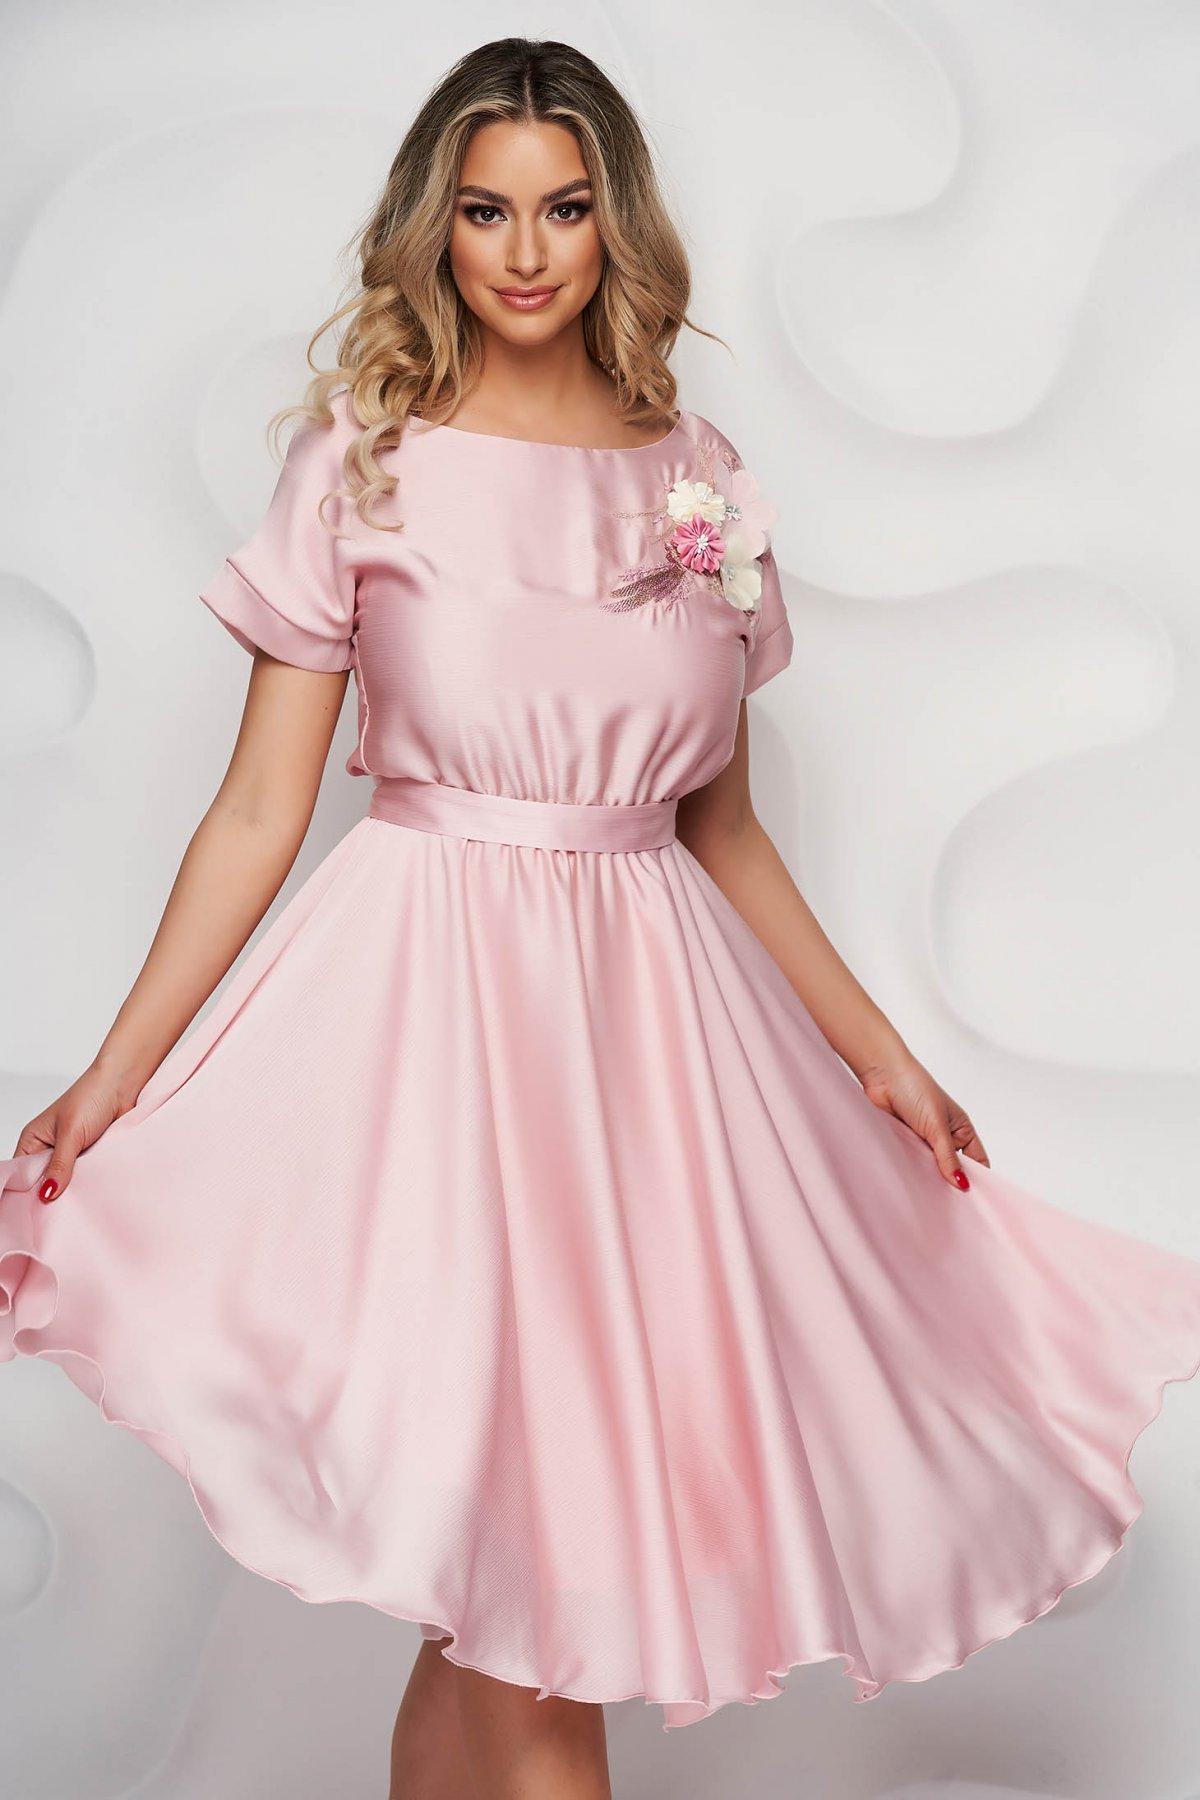 Rochie StarShinerS eleganta roz prafuit midi in clos din chiffon creponat cu elastic in talie si broderie florala - medelin.ro